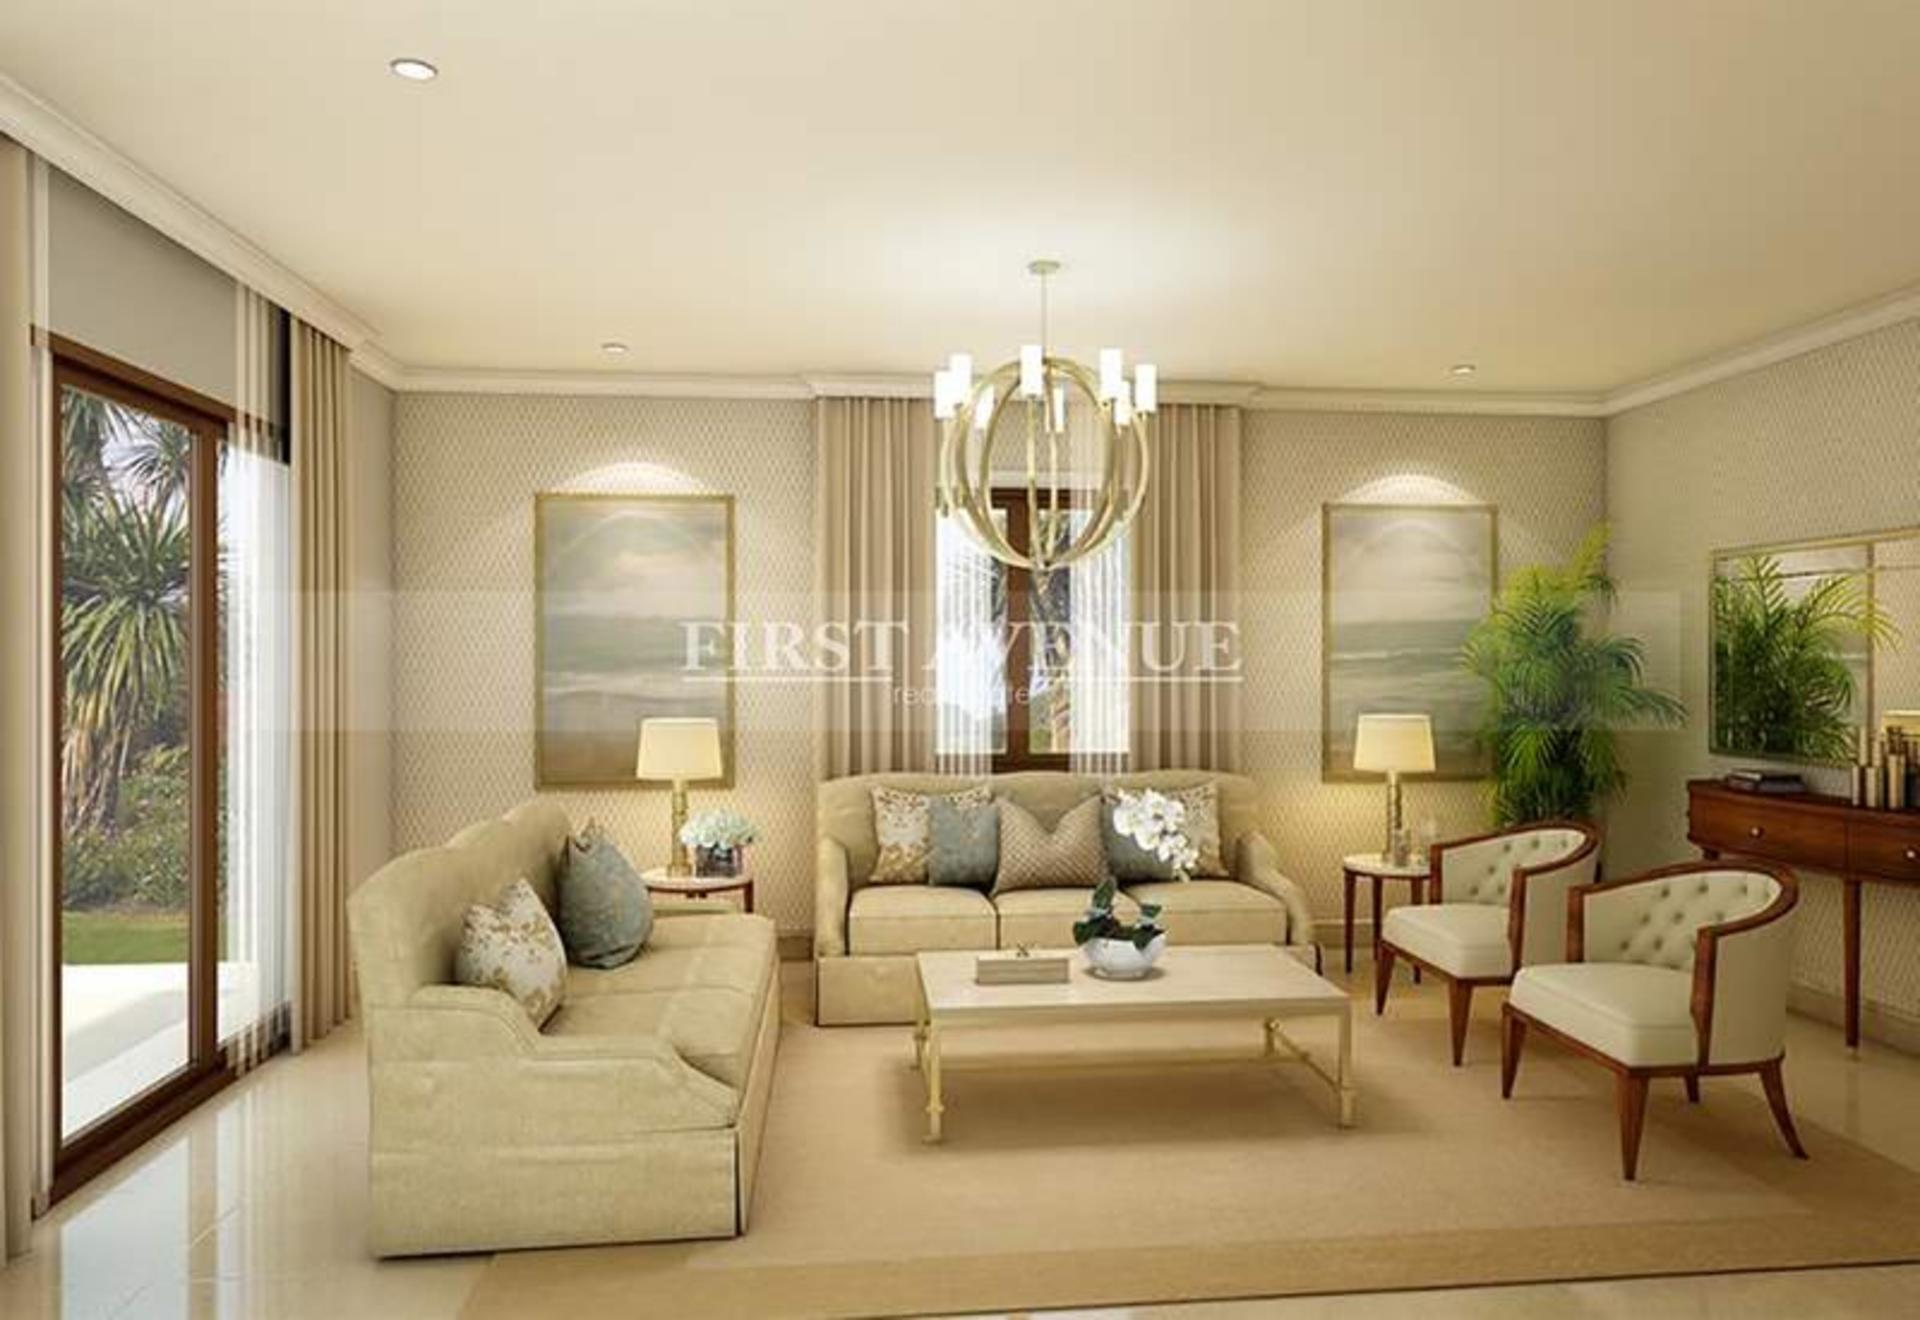 READY SOON 3 Bedrooms + Maids, Lila Villa Arabian Ranches TYPE 1